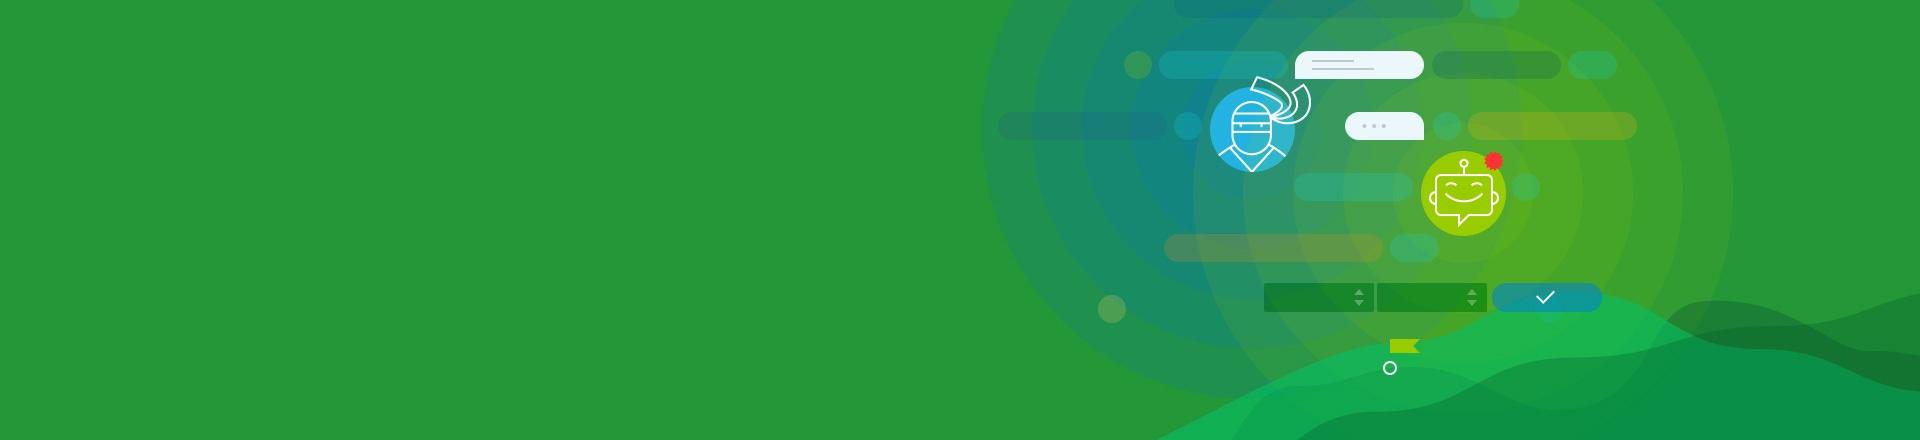 Telerik UI R2 2018 Release Webinar